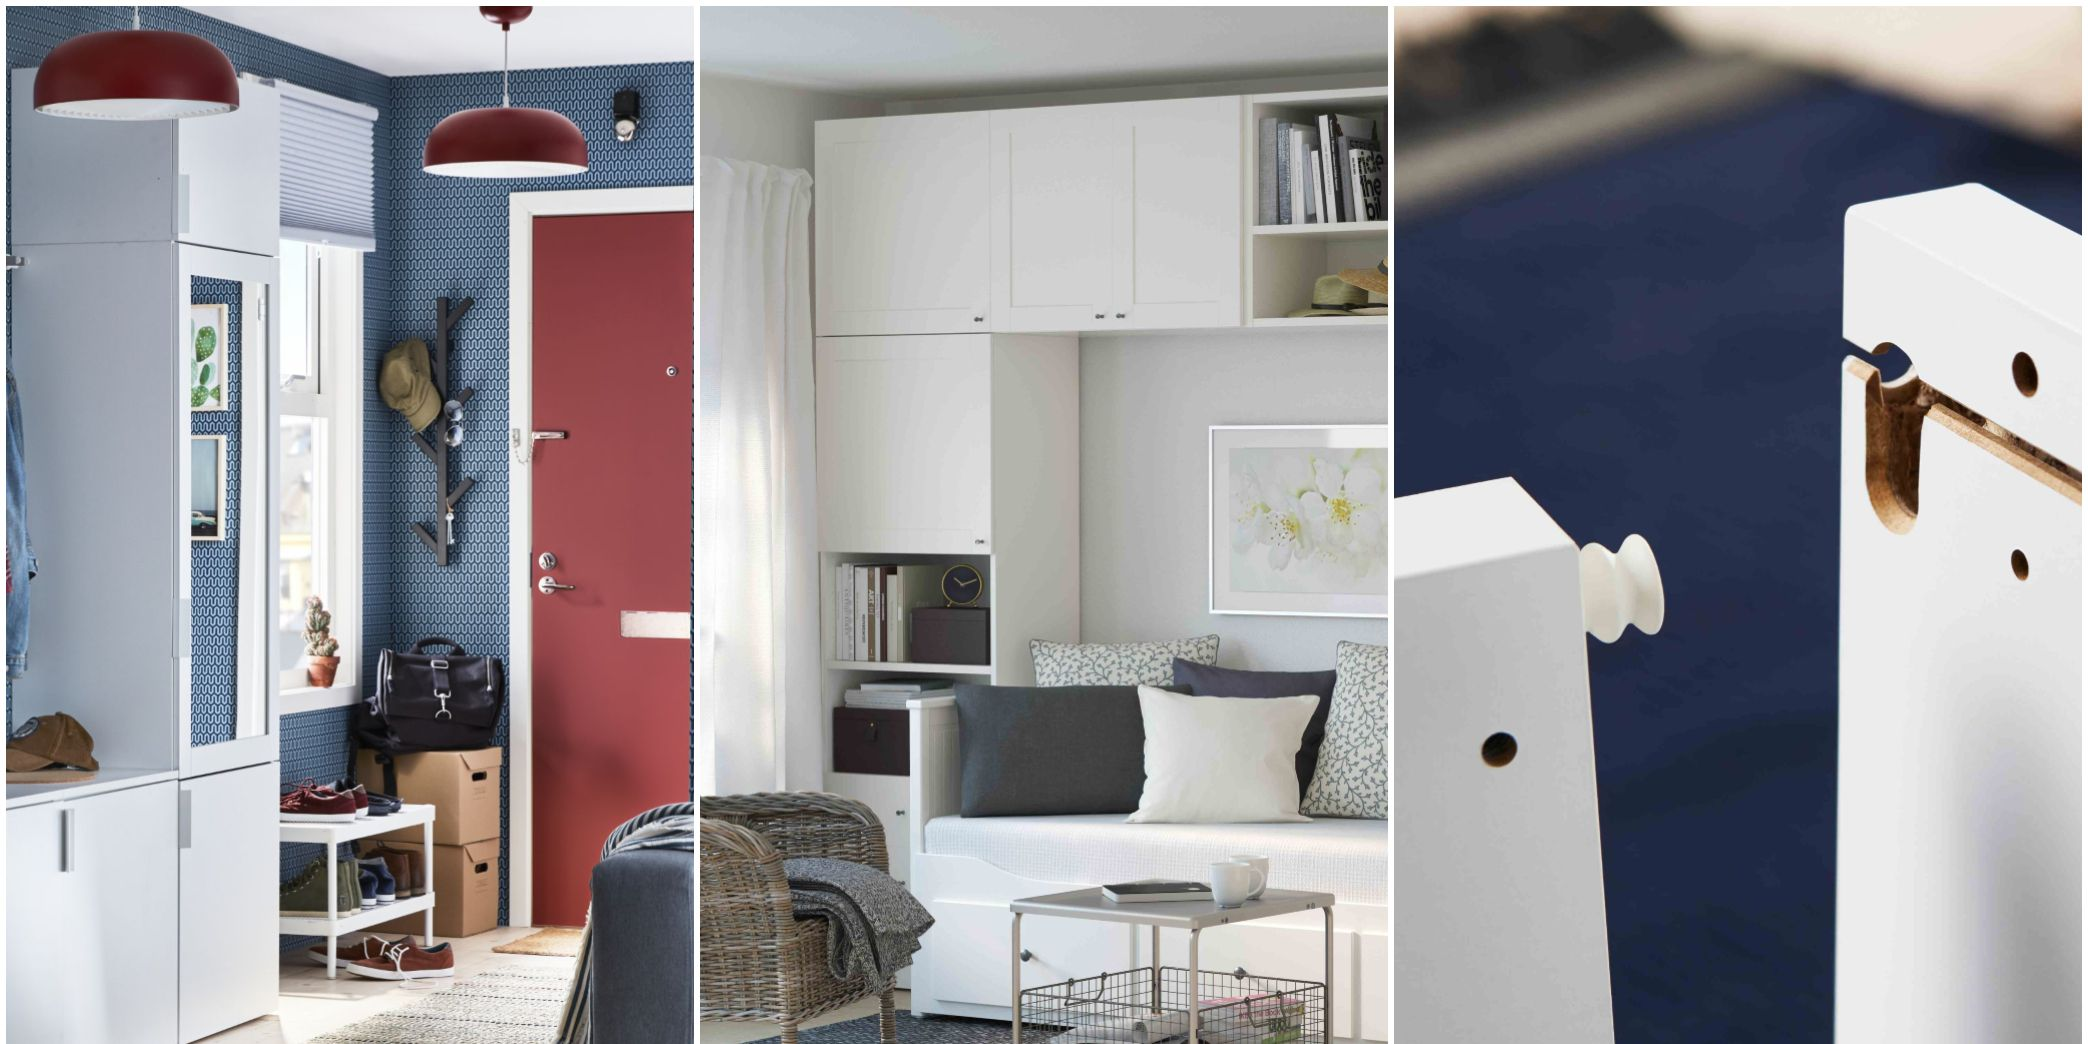 Ikea PLATSA range - storage system - wedge dowel